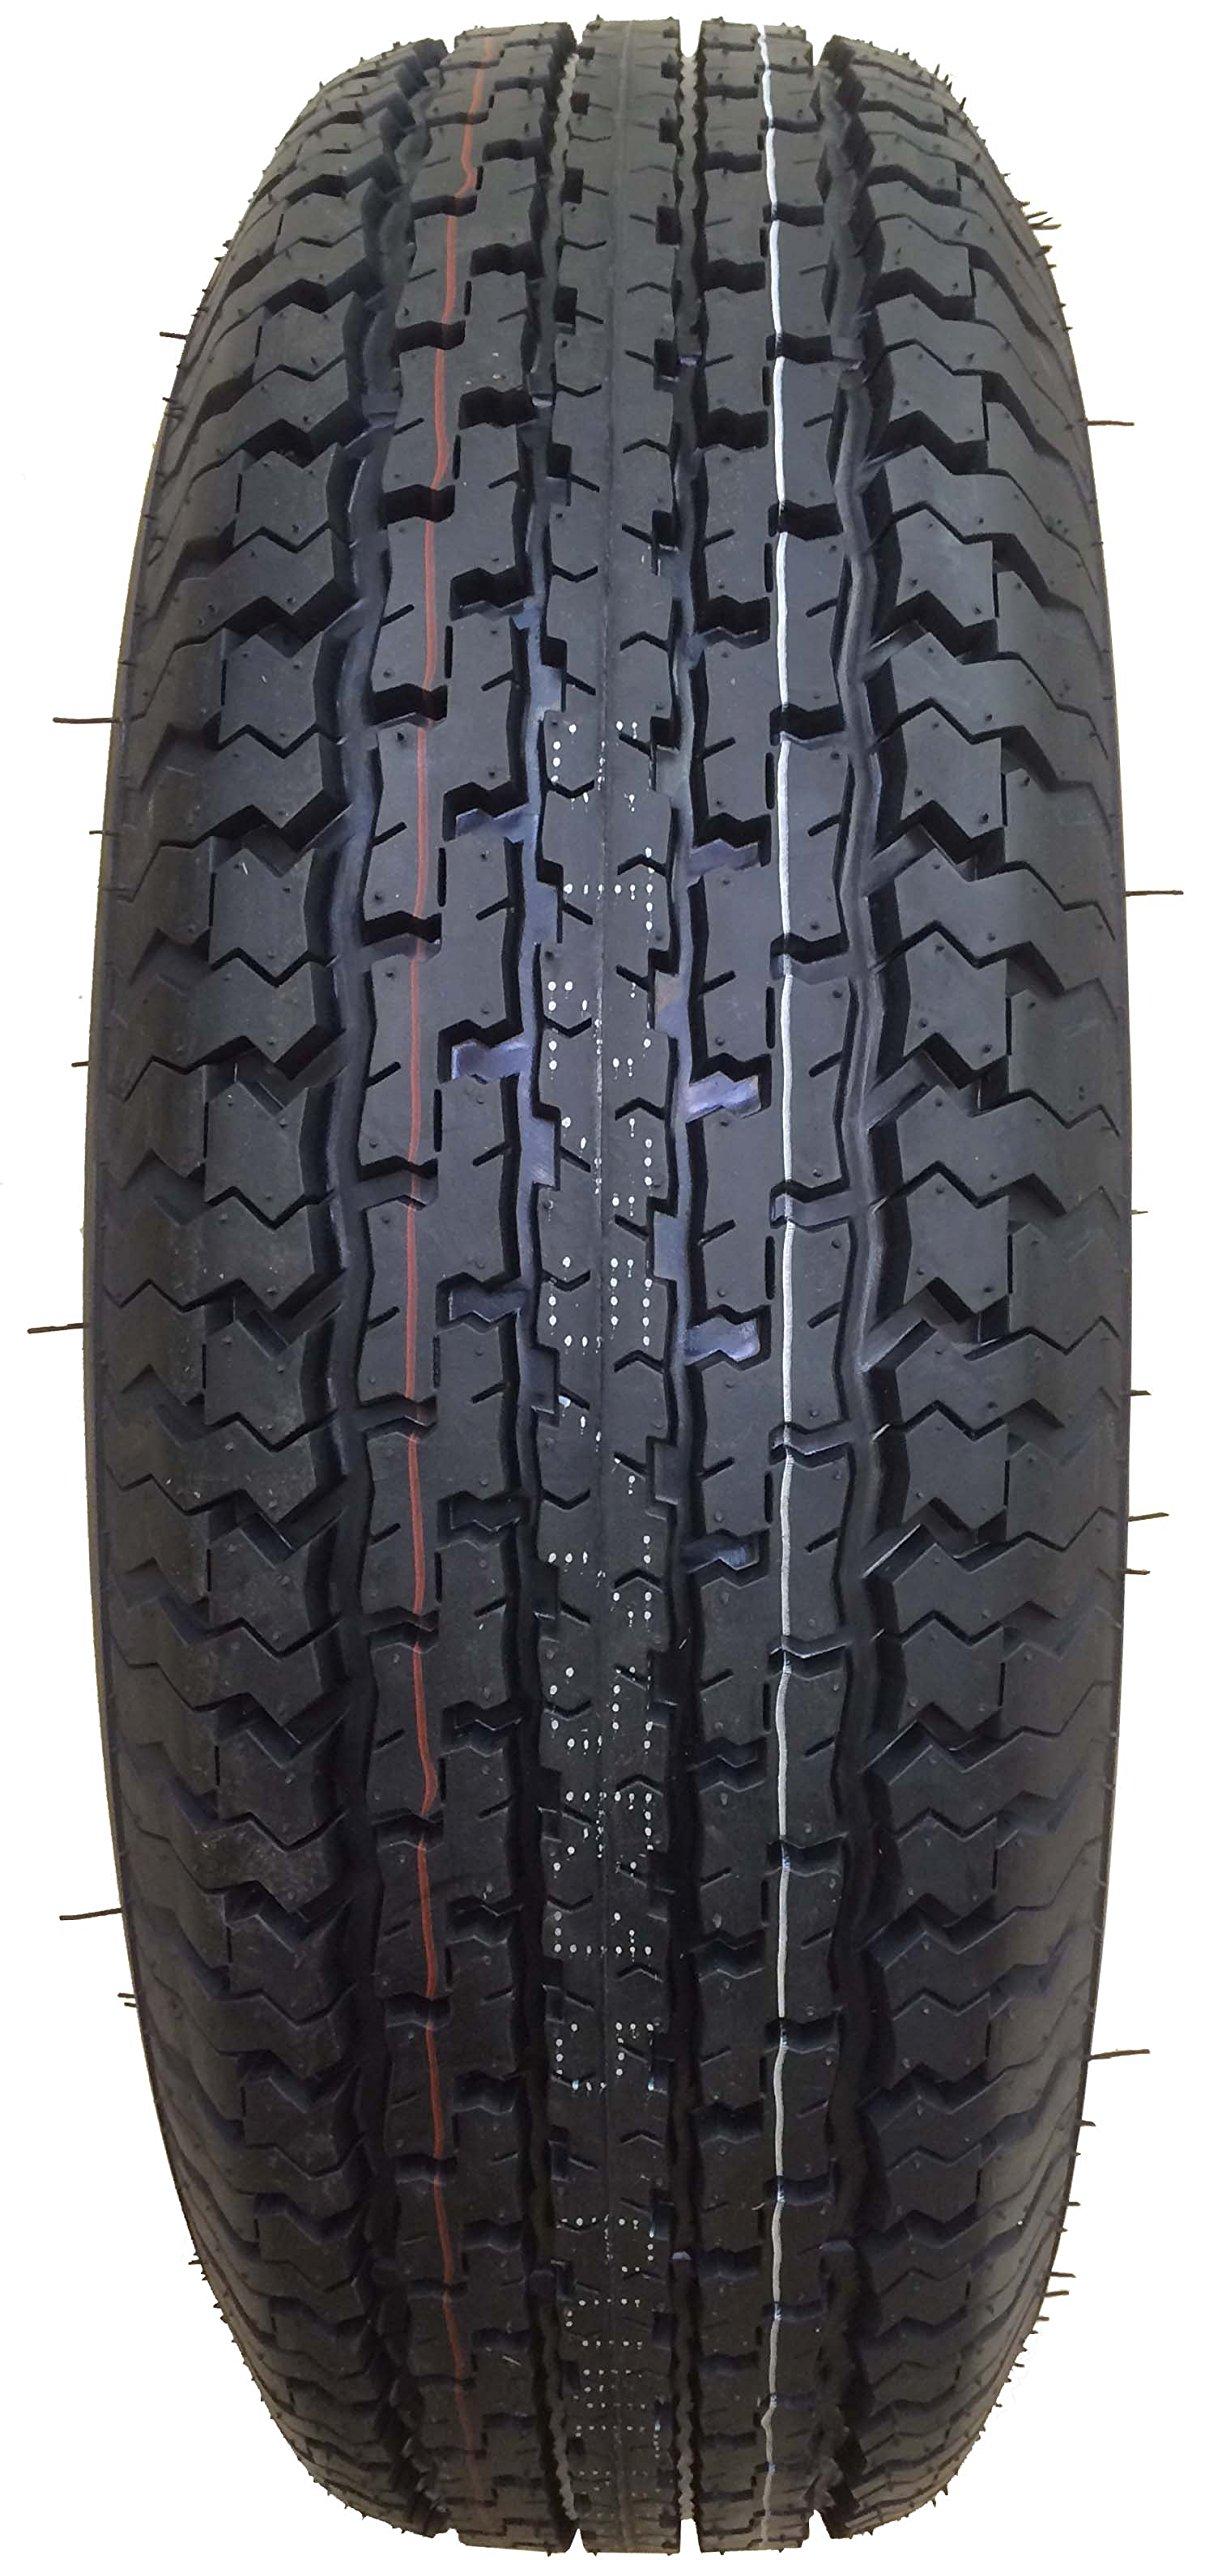 2 New Premium Trailer Tires ST 225/75R15 10PR Load Range E - 11017